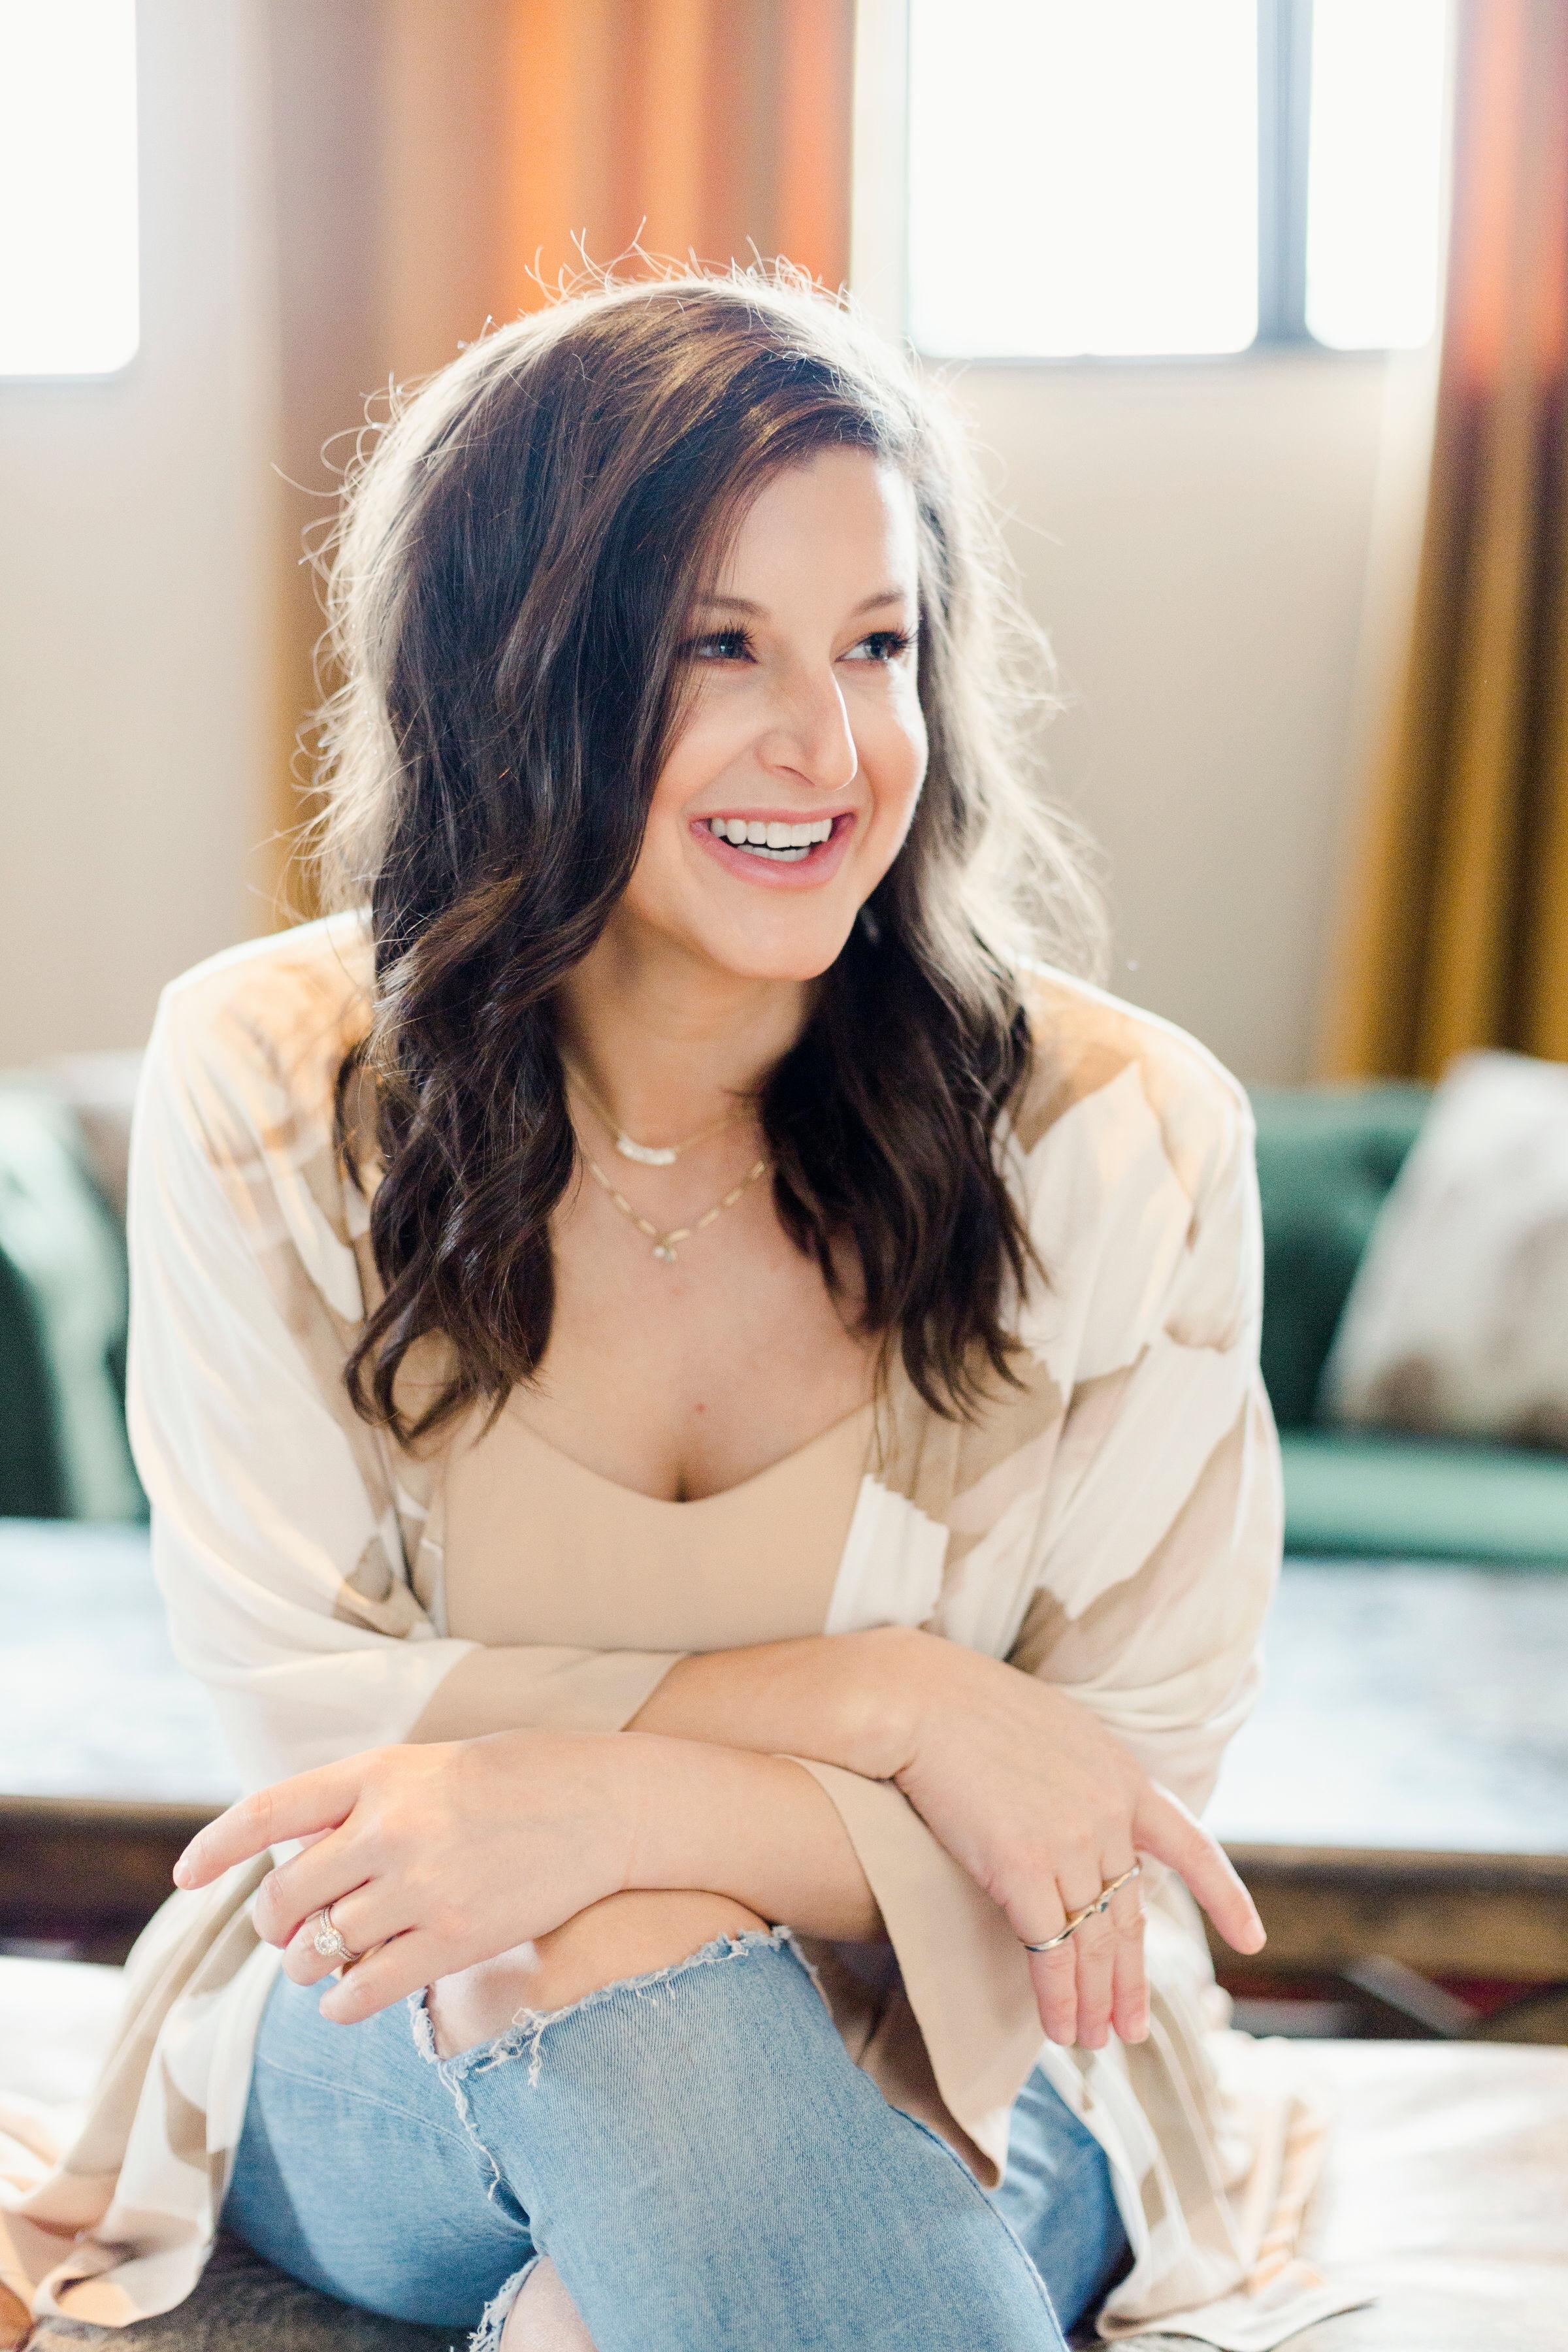 Jessica-Zimmerman-Events-Top-Wedding-Industry-Educator.JPG